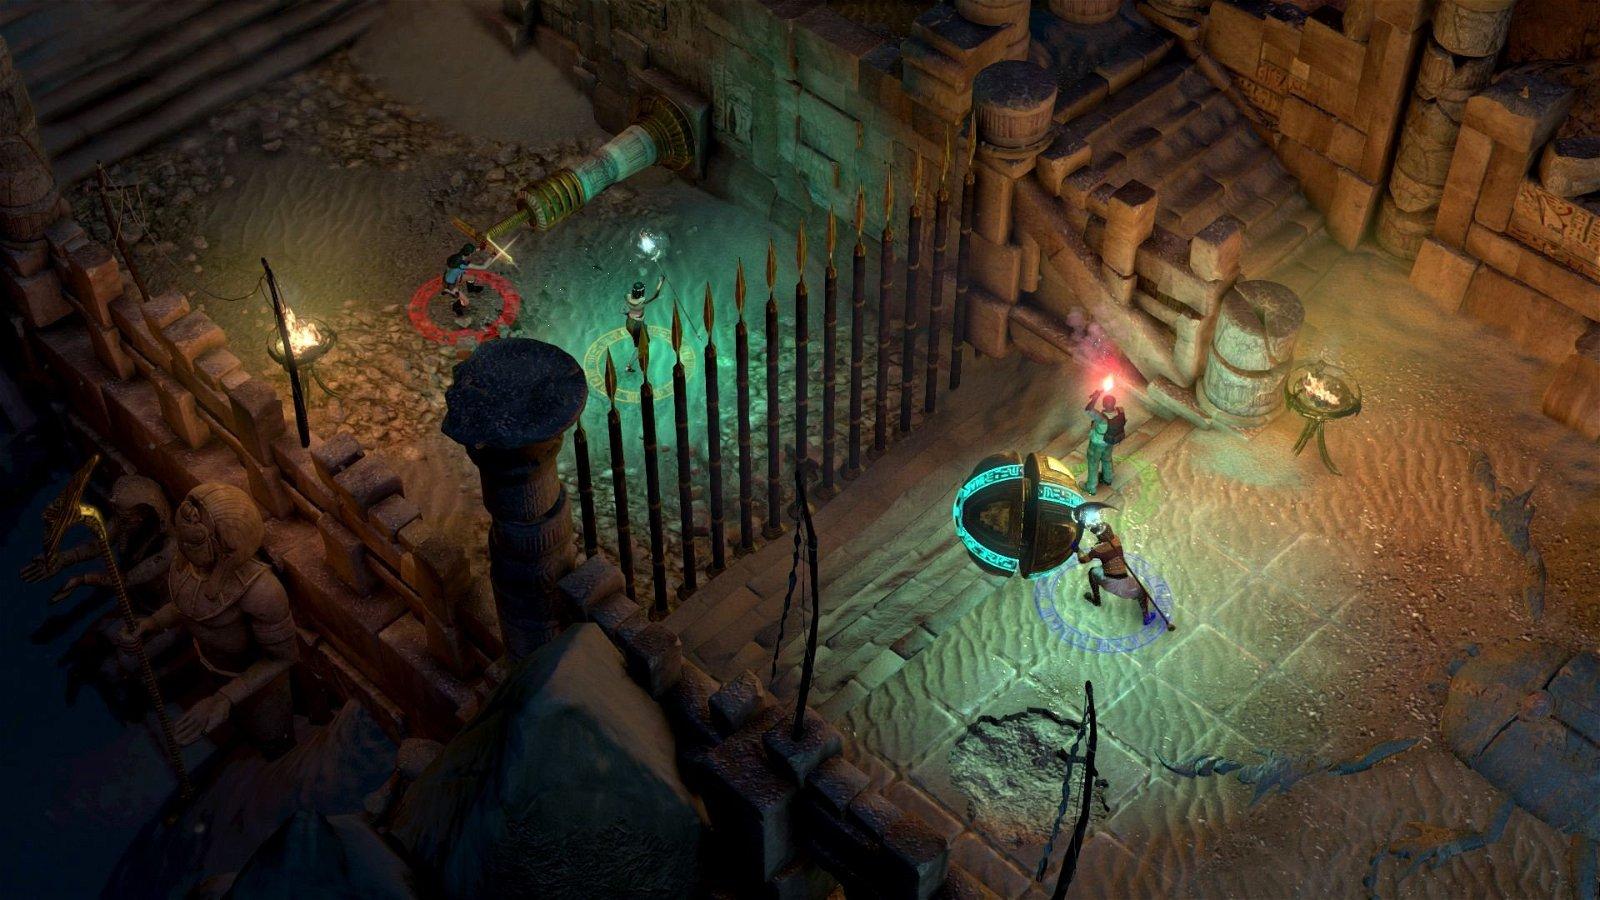 Lara_Croft_And_The_Temple_Of_Osiris-2621625